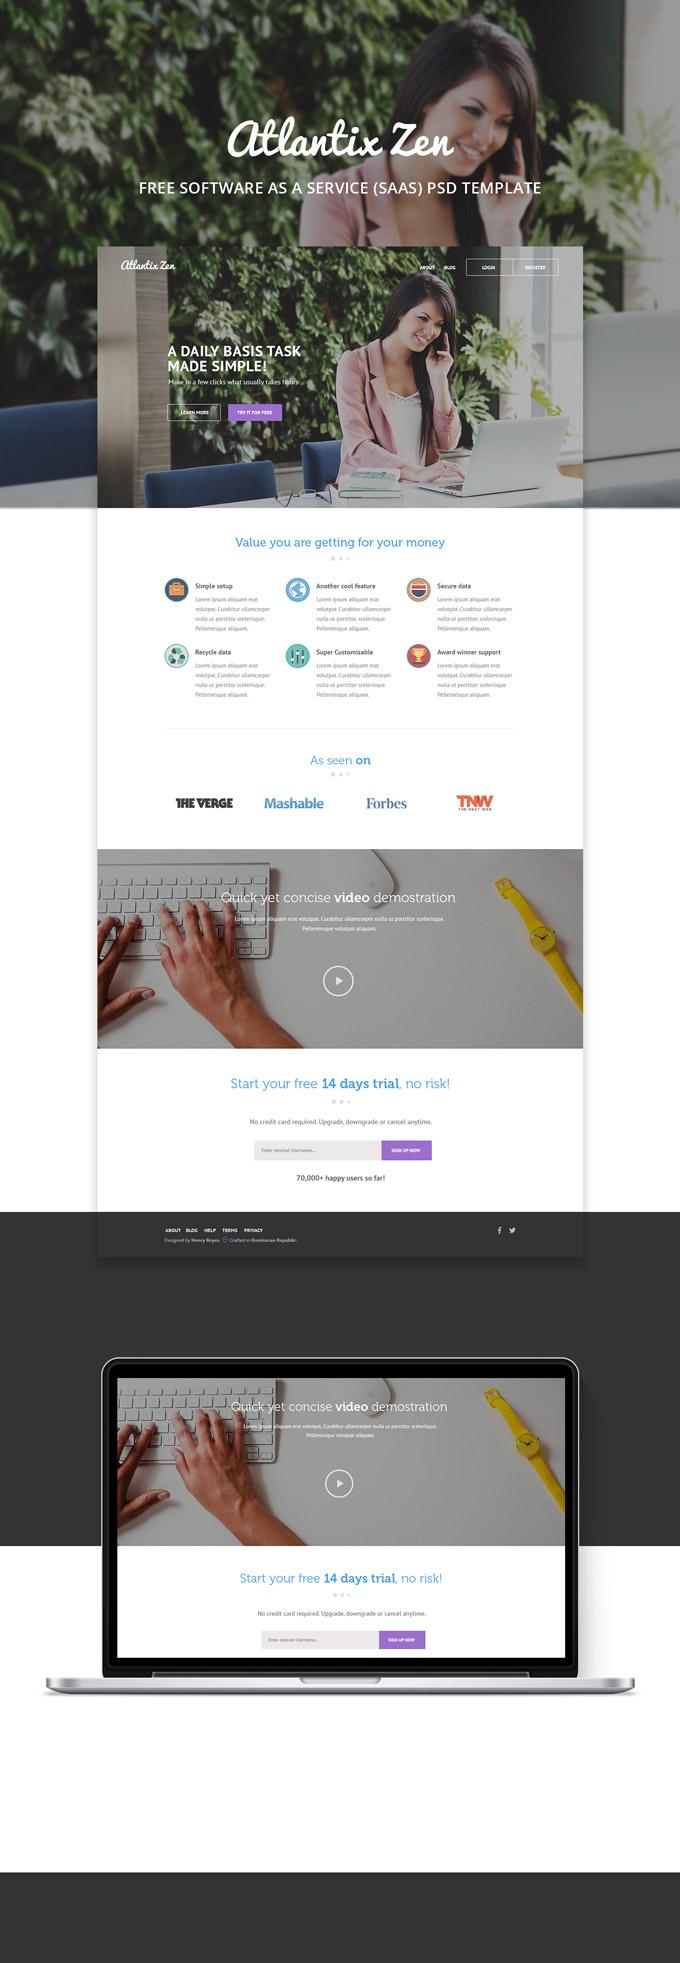 Atlantix Zen - SAAS free PSD web template